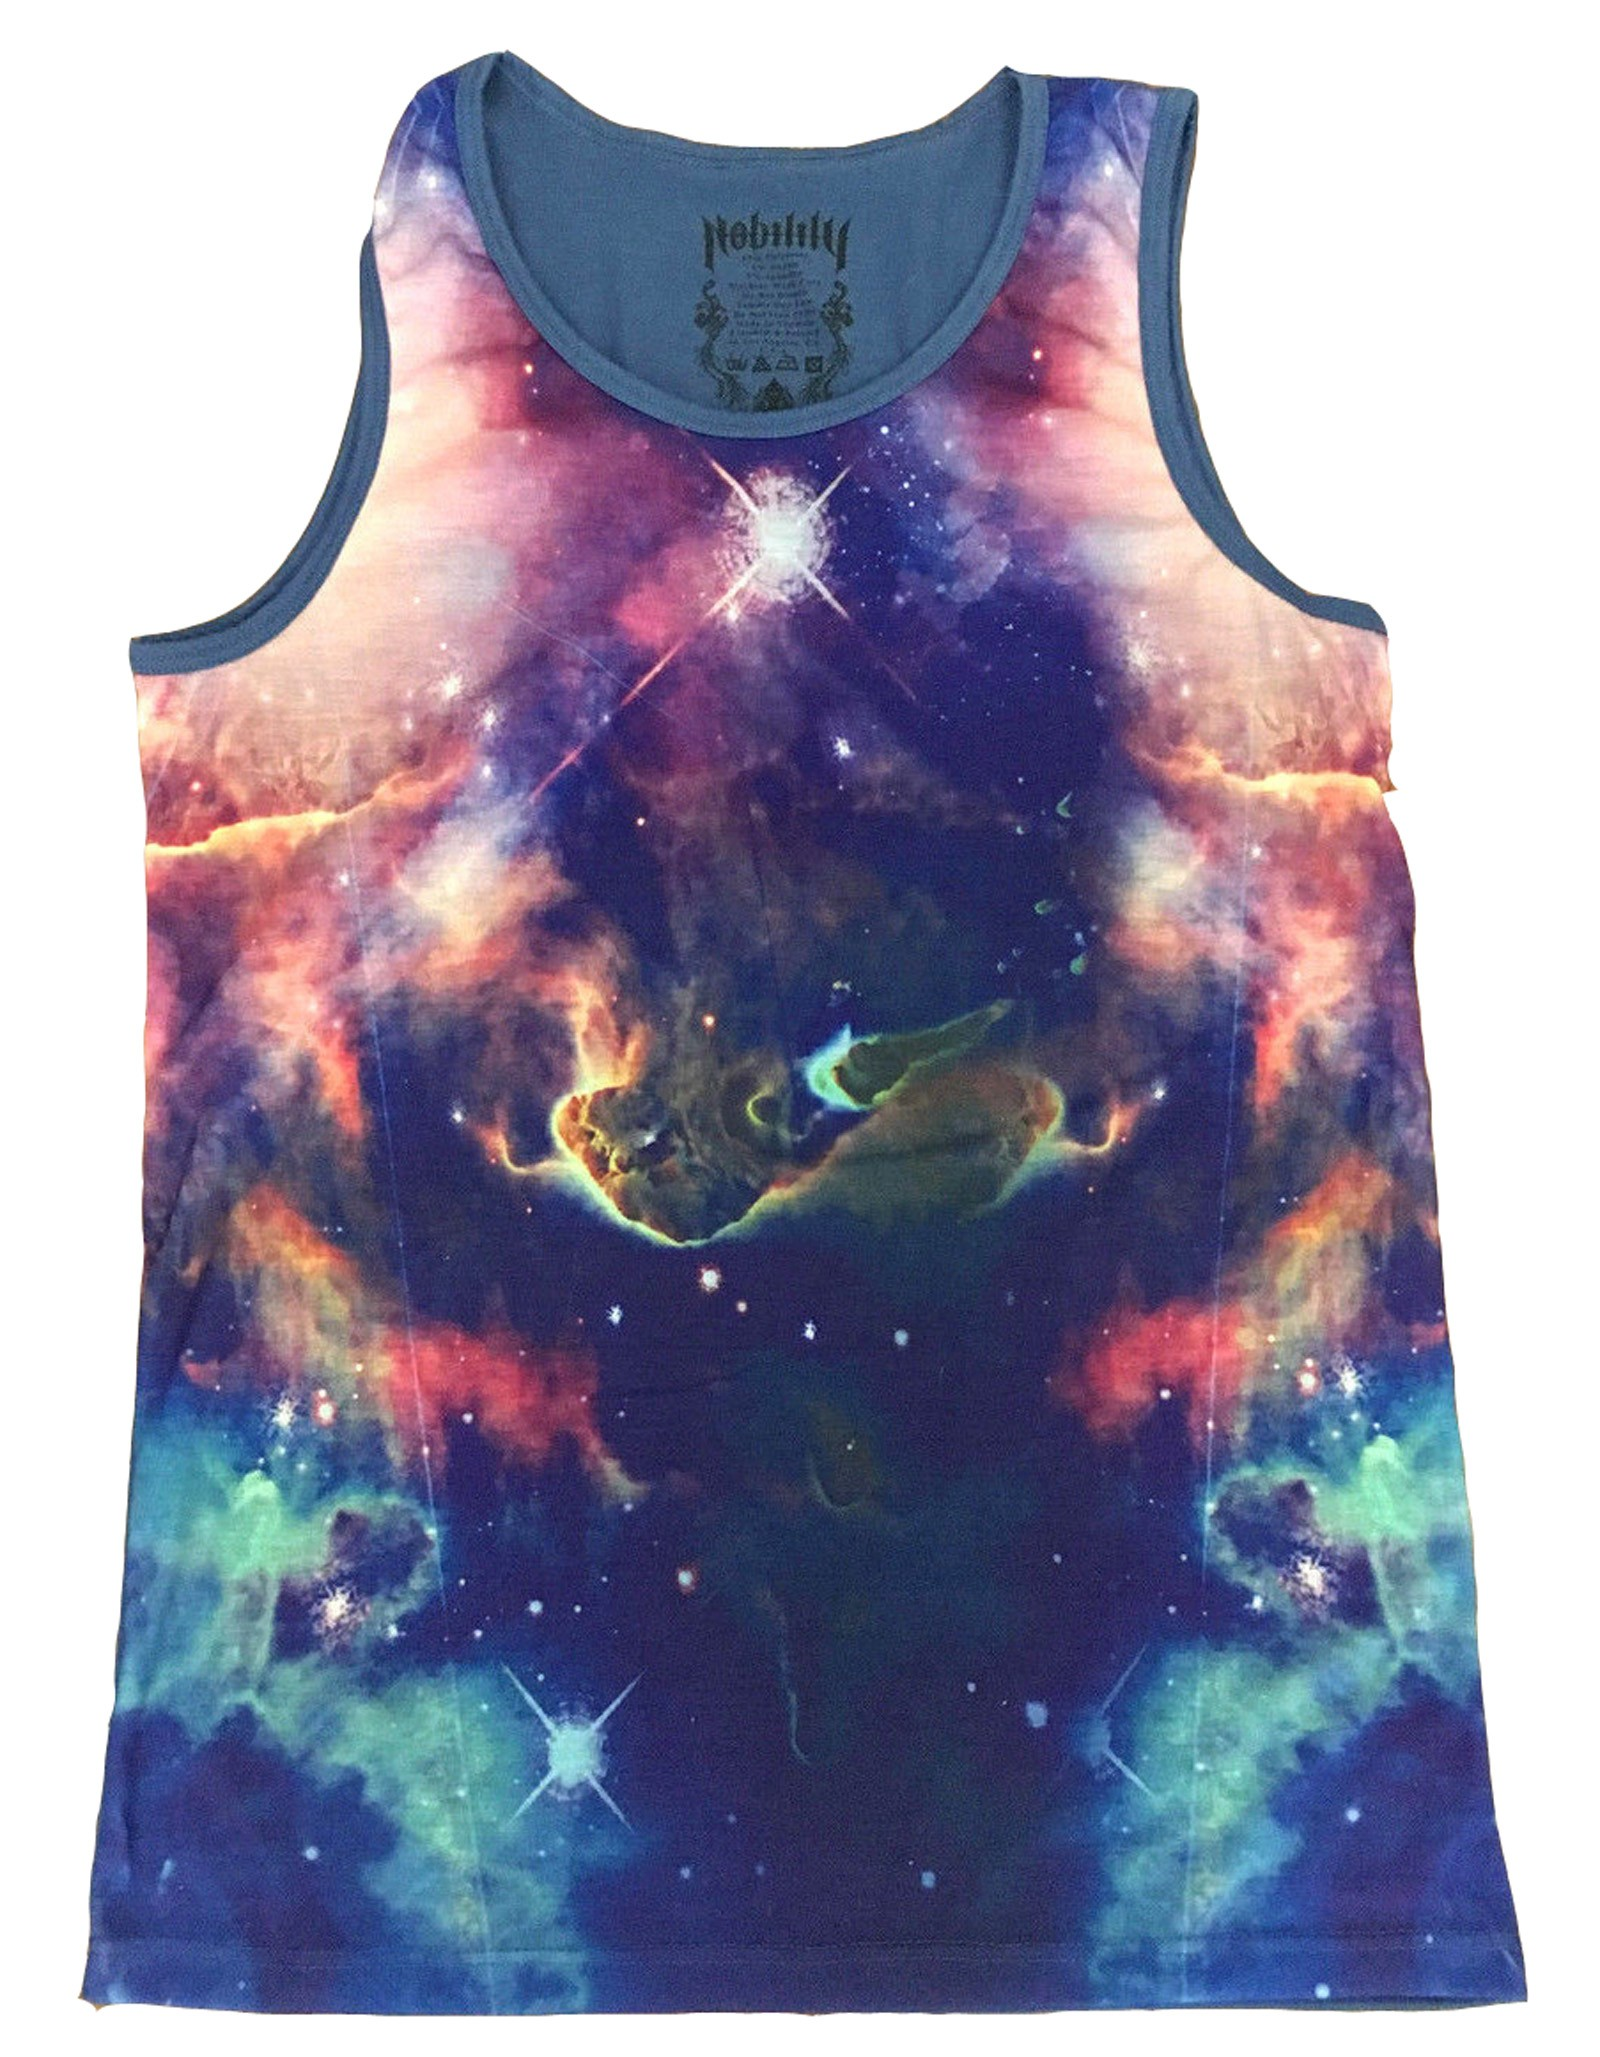 Xzavier - Nobility Galaxy Tank Top Shirt